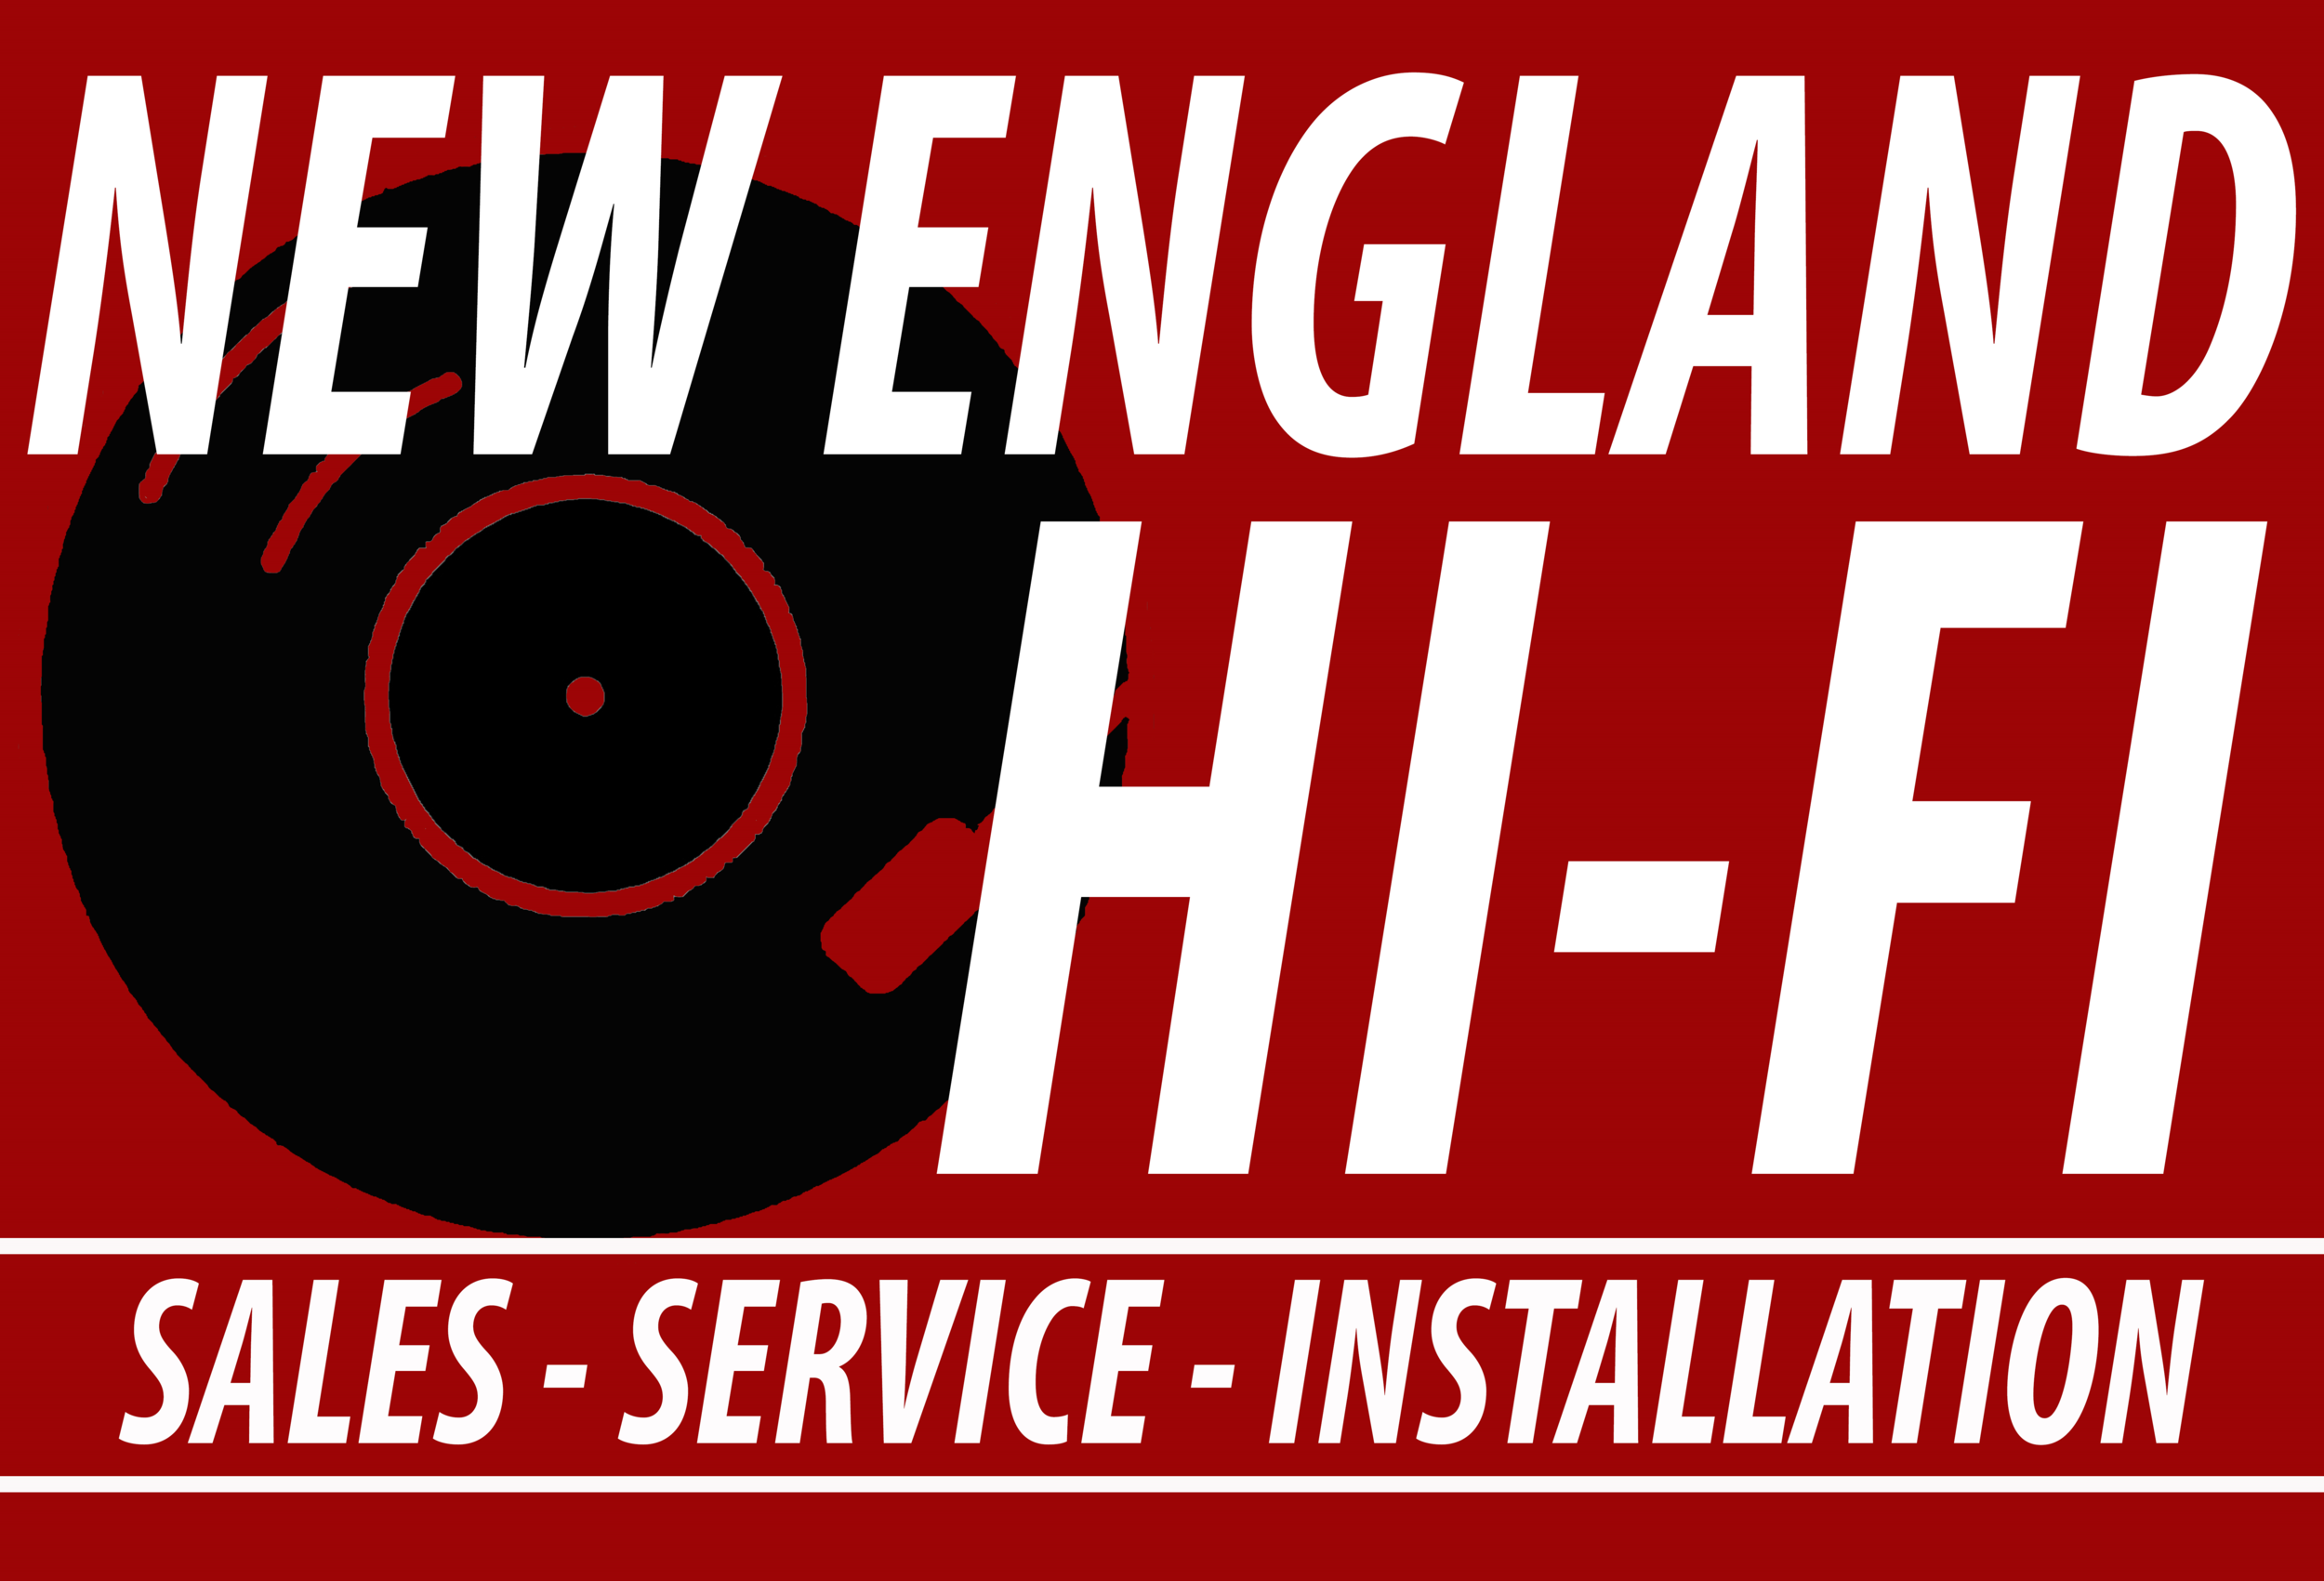 New England Hi-Fi